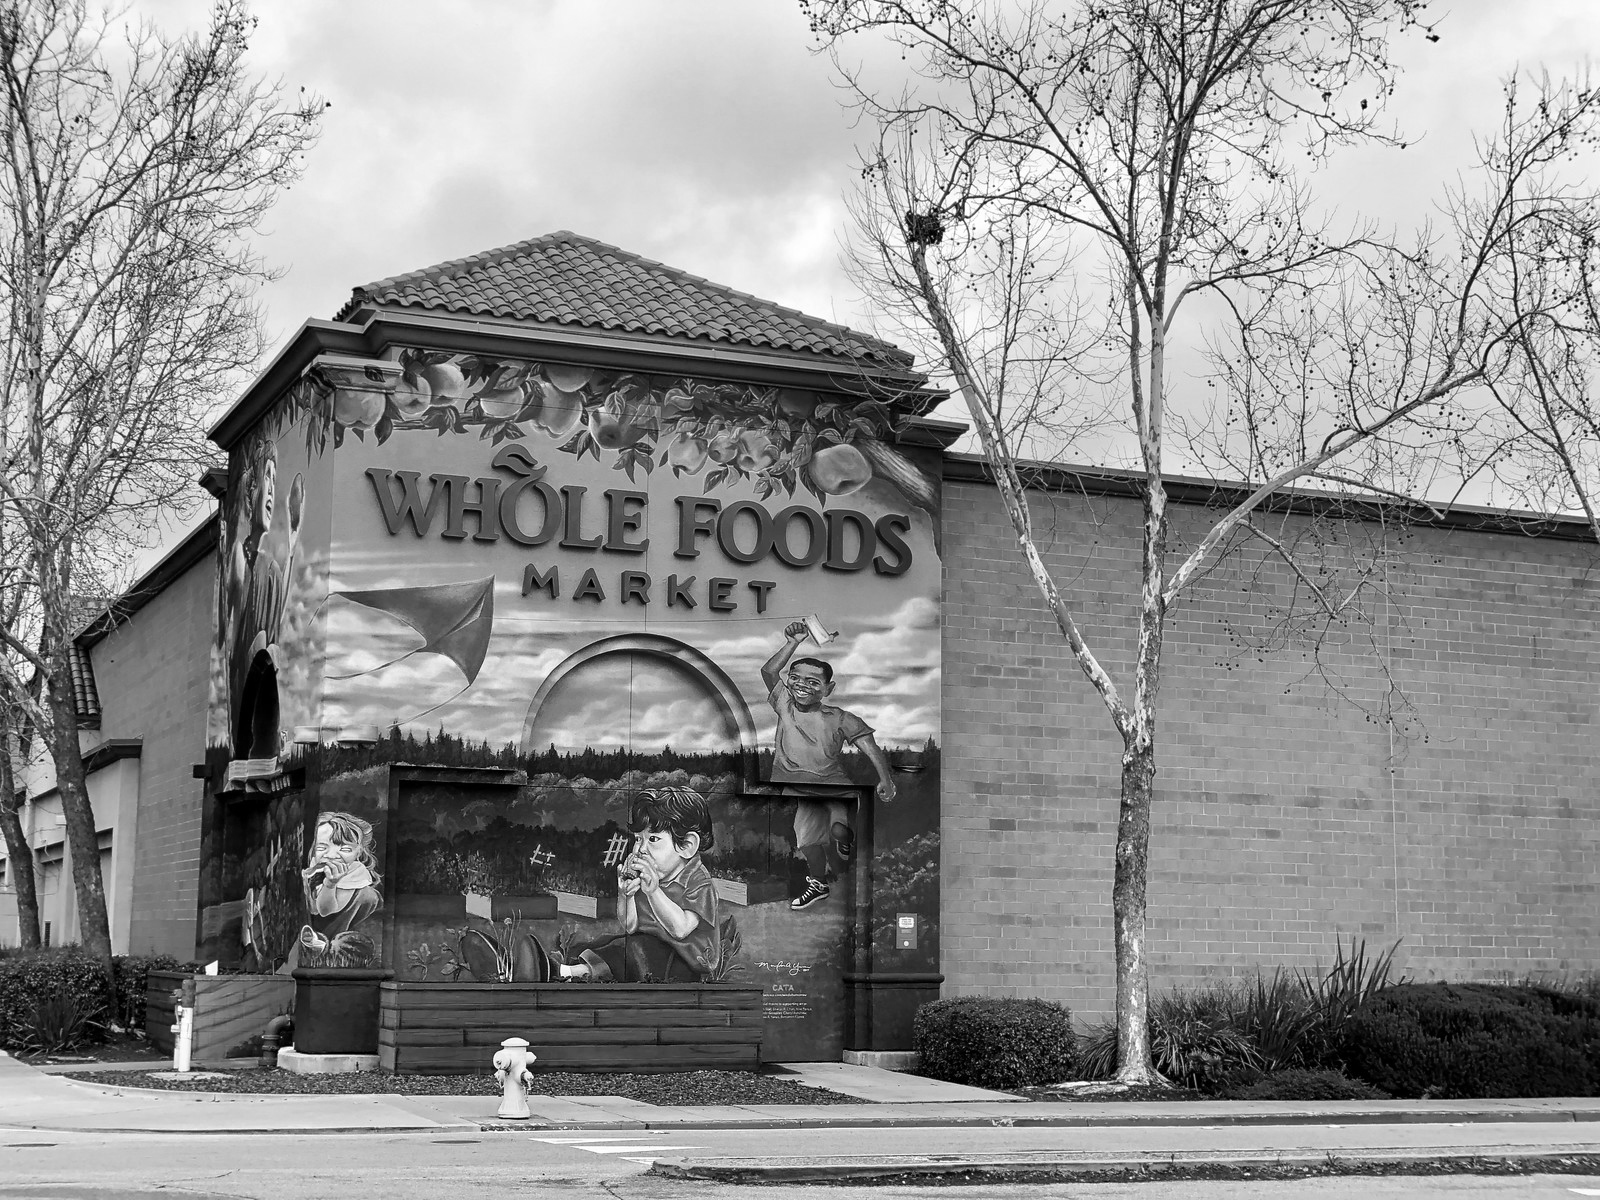 Whole+Foods+Market+Grocery+Store+Redwood+City+Blu+Skye+Media-X3.jpg